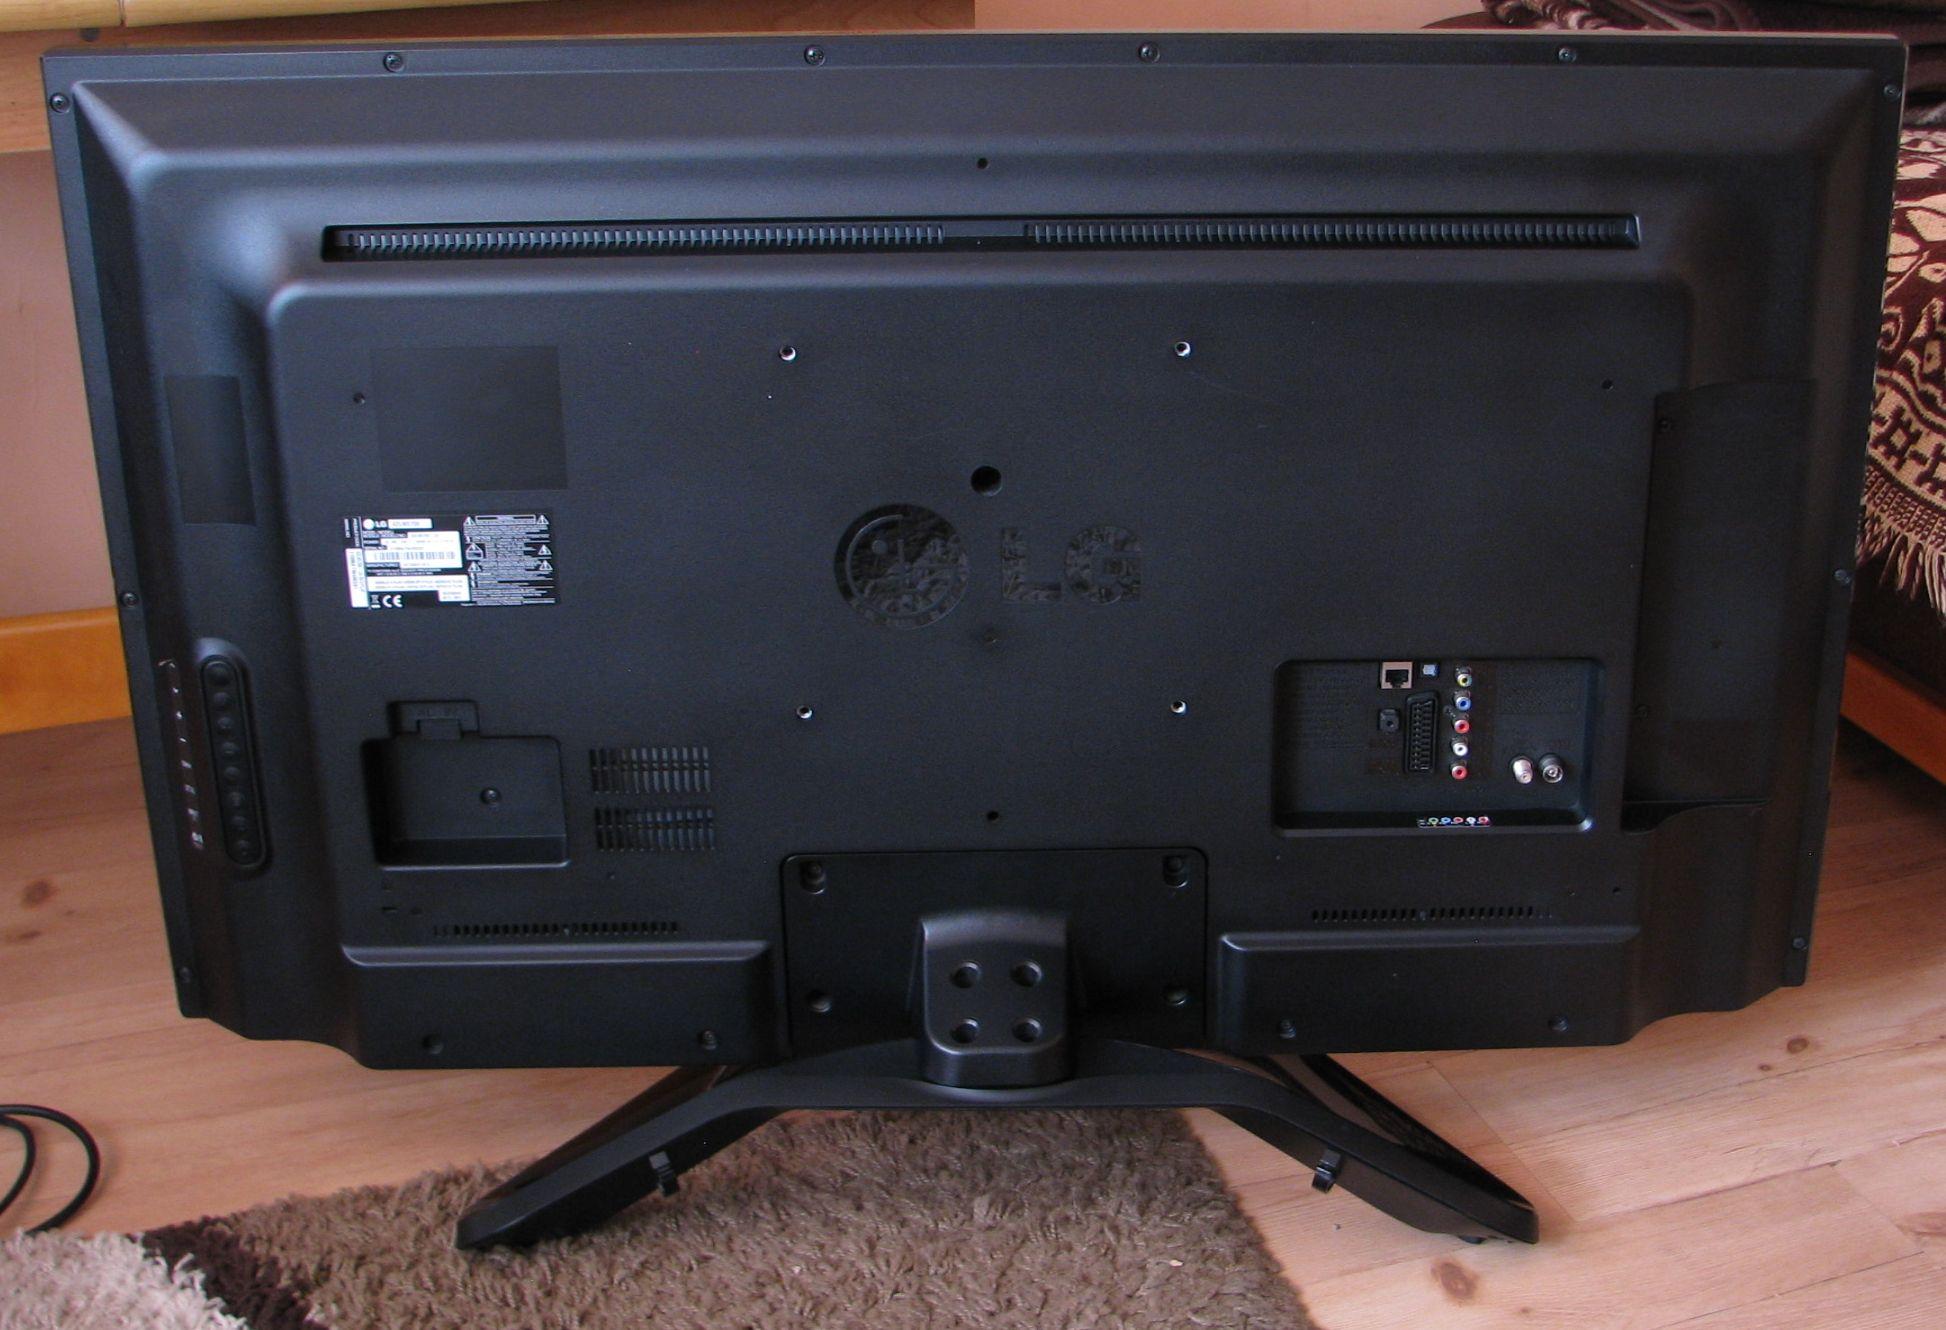 Betere Telewizor LED LG 42LN5708 - Smart TV - WiFi - GW - 7455155315 IW-59